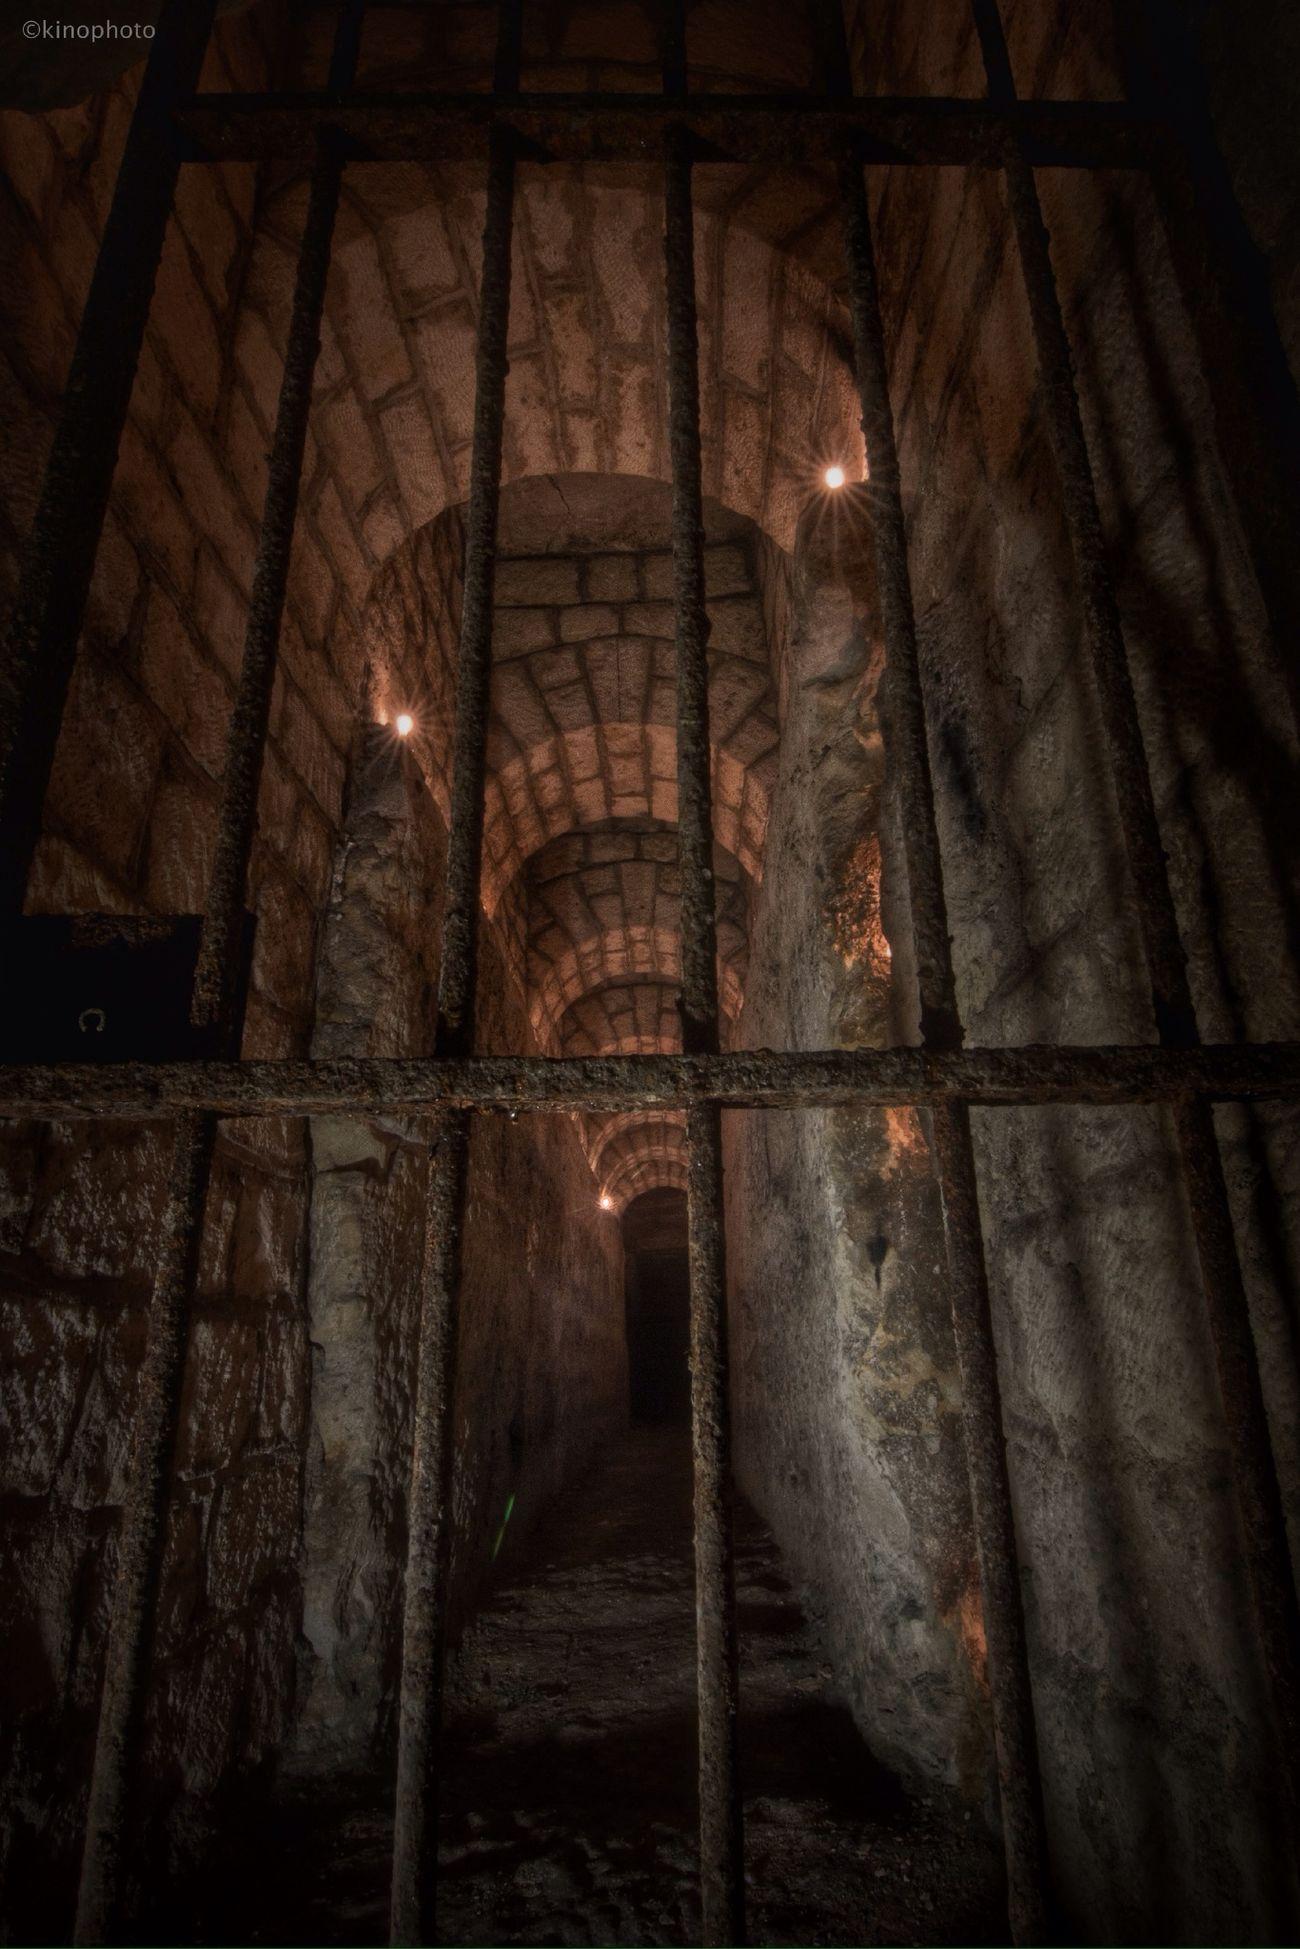 Paris Urbex Catacombs EyeEm Best Shots - HDR